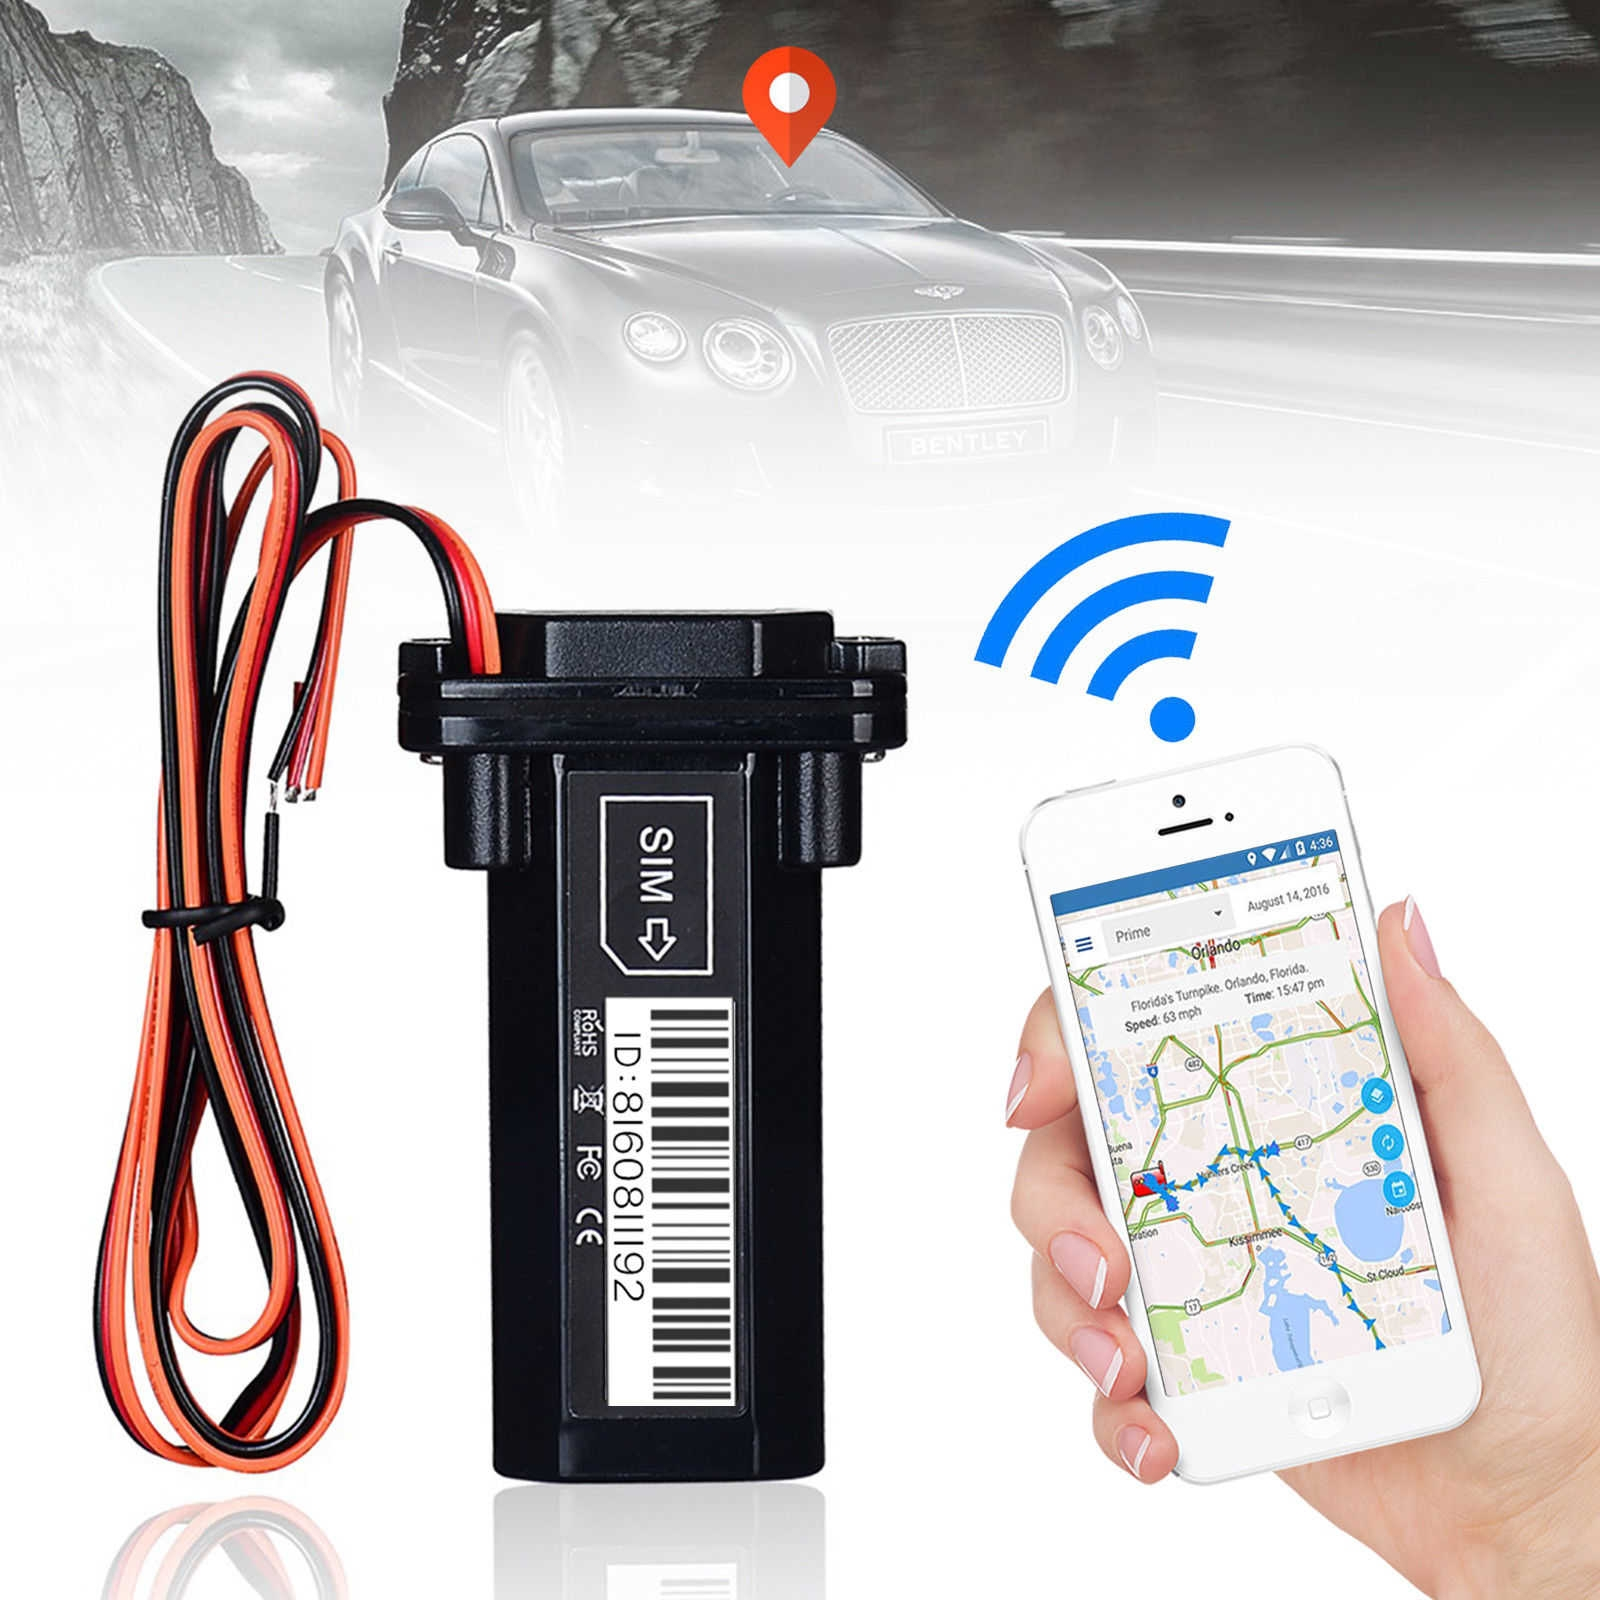 Generic GPS Satellite Positioning Tracker For Car- Black